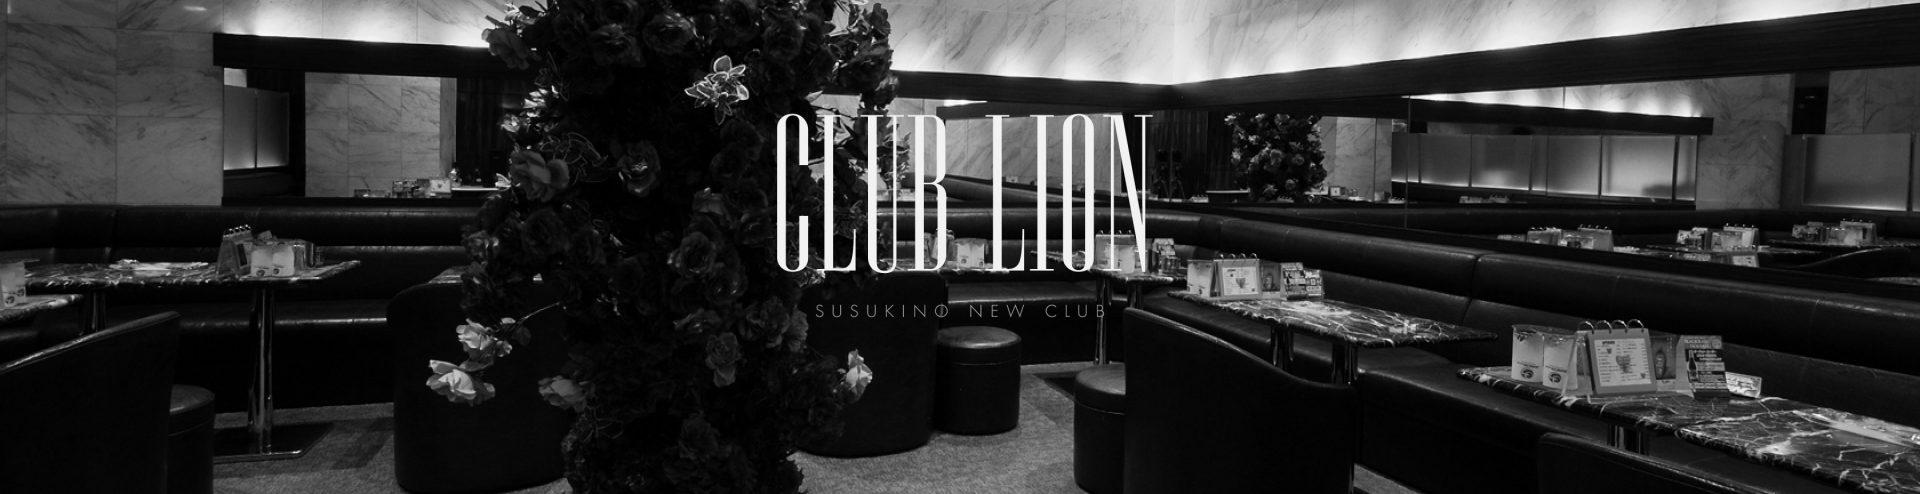 CLUBLION すすきの ニュークラブ